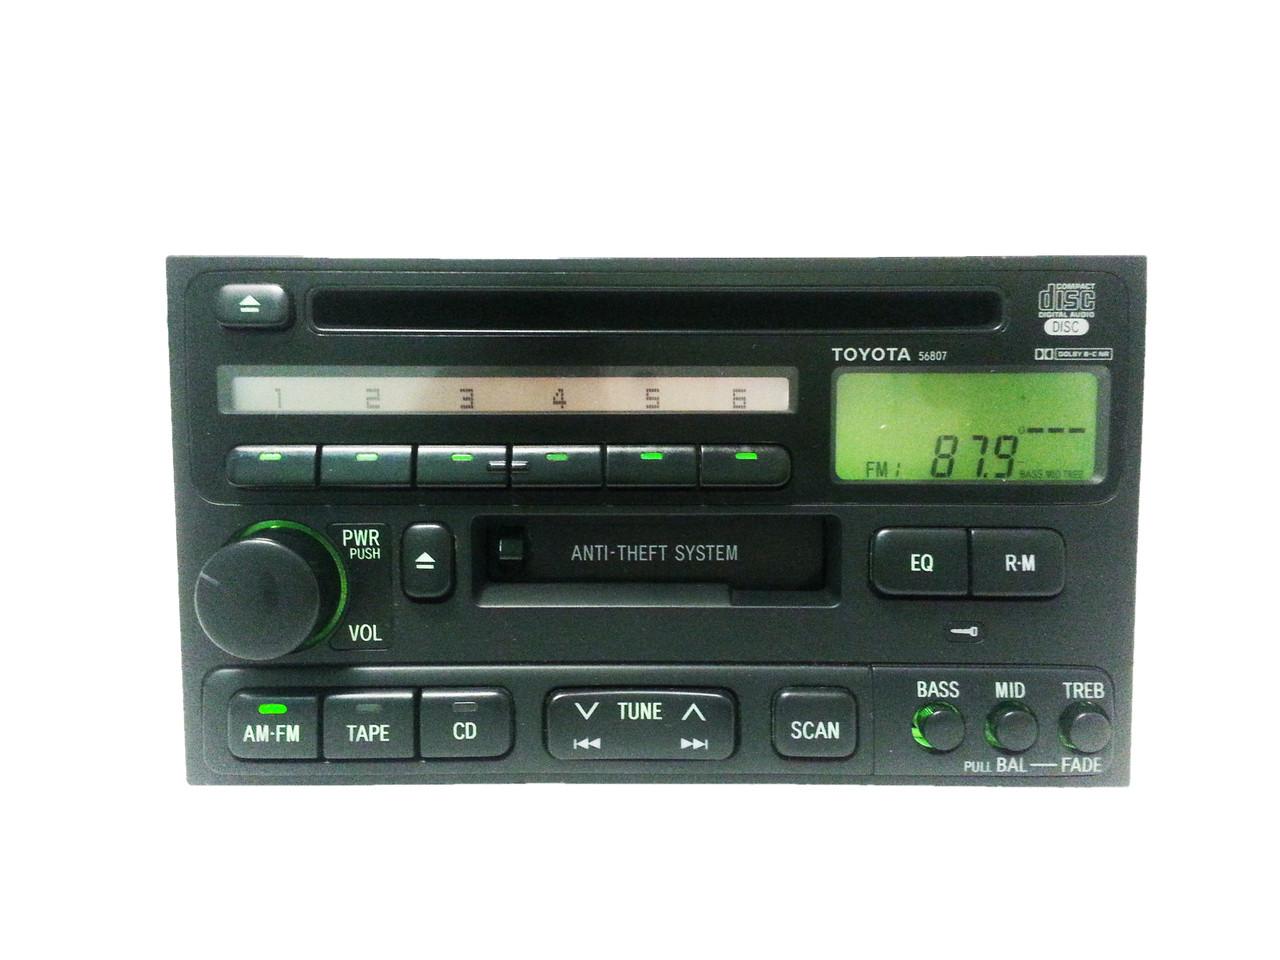 medium resolution of toyota factory oem radio tape and cd player 4runner avalon camry celica land cruiser solara sienna 56807 86120 33040 1990 1991 1992 1993 1994 1995 1996